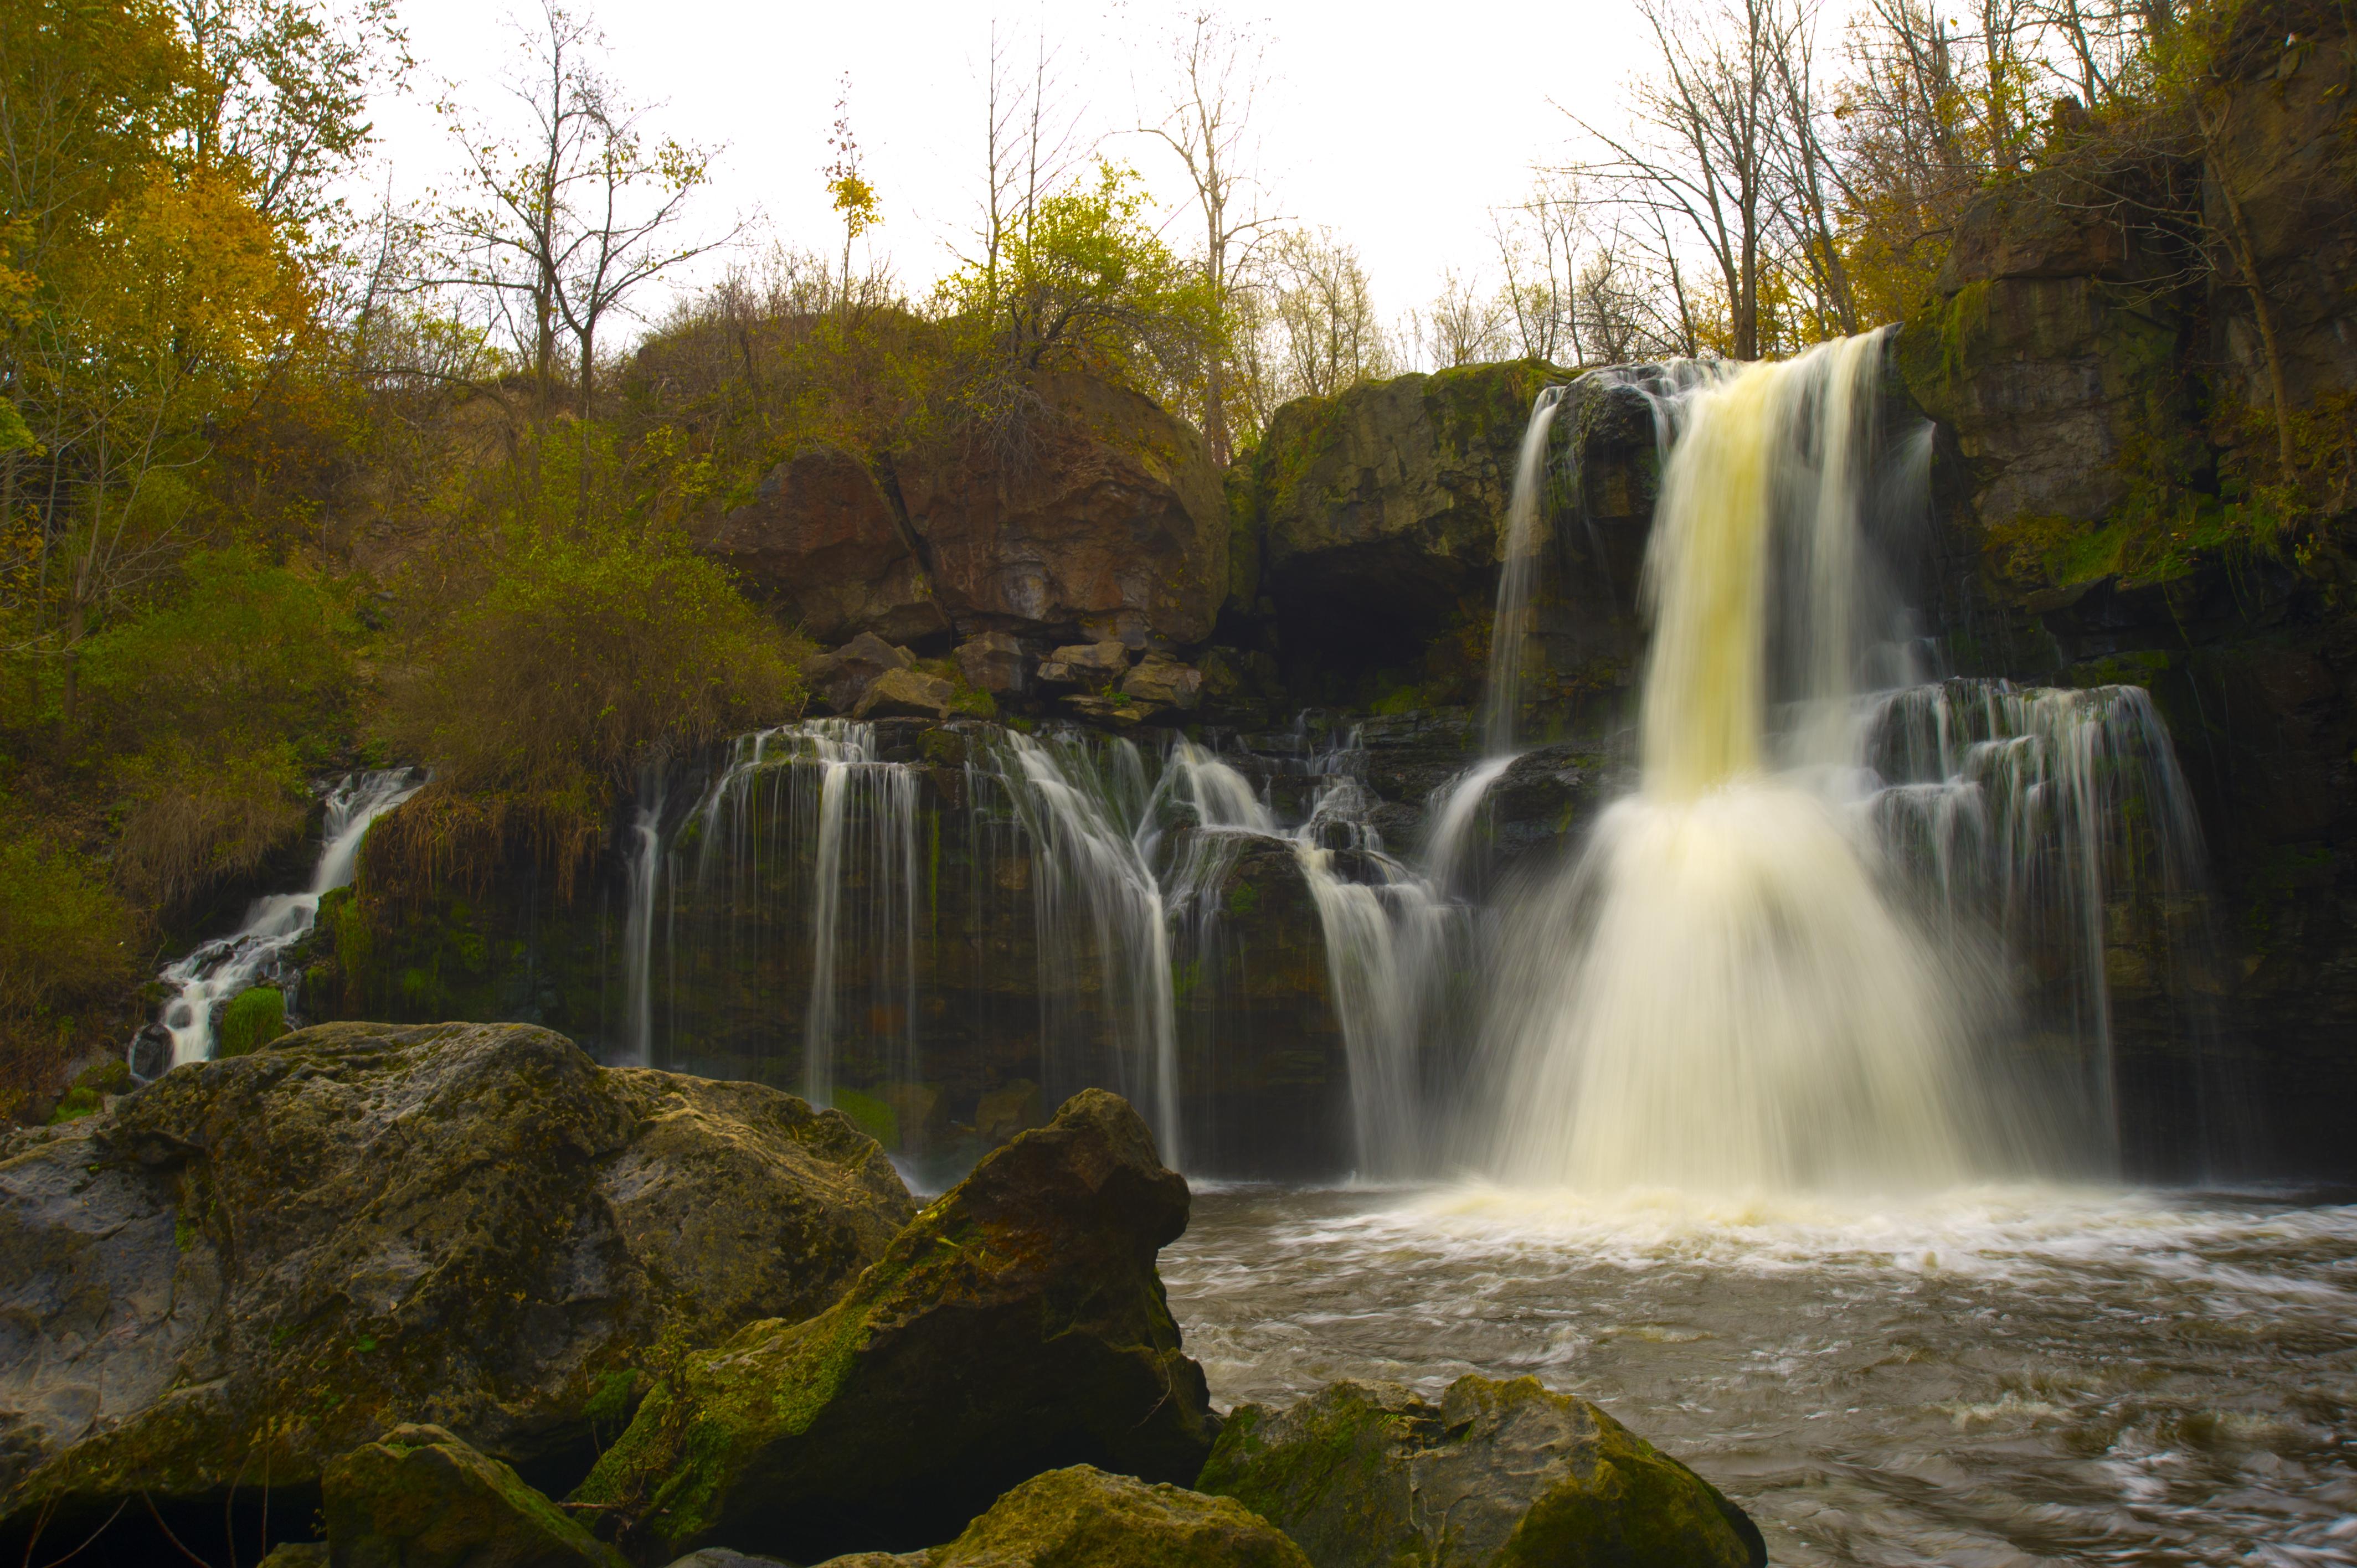 I took this image at Akron Falls outside of Buffalo NY